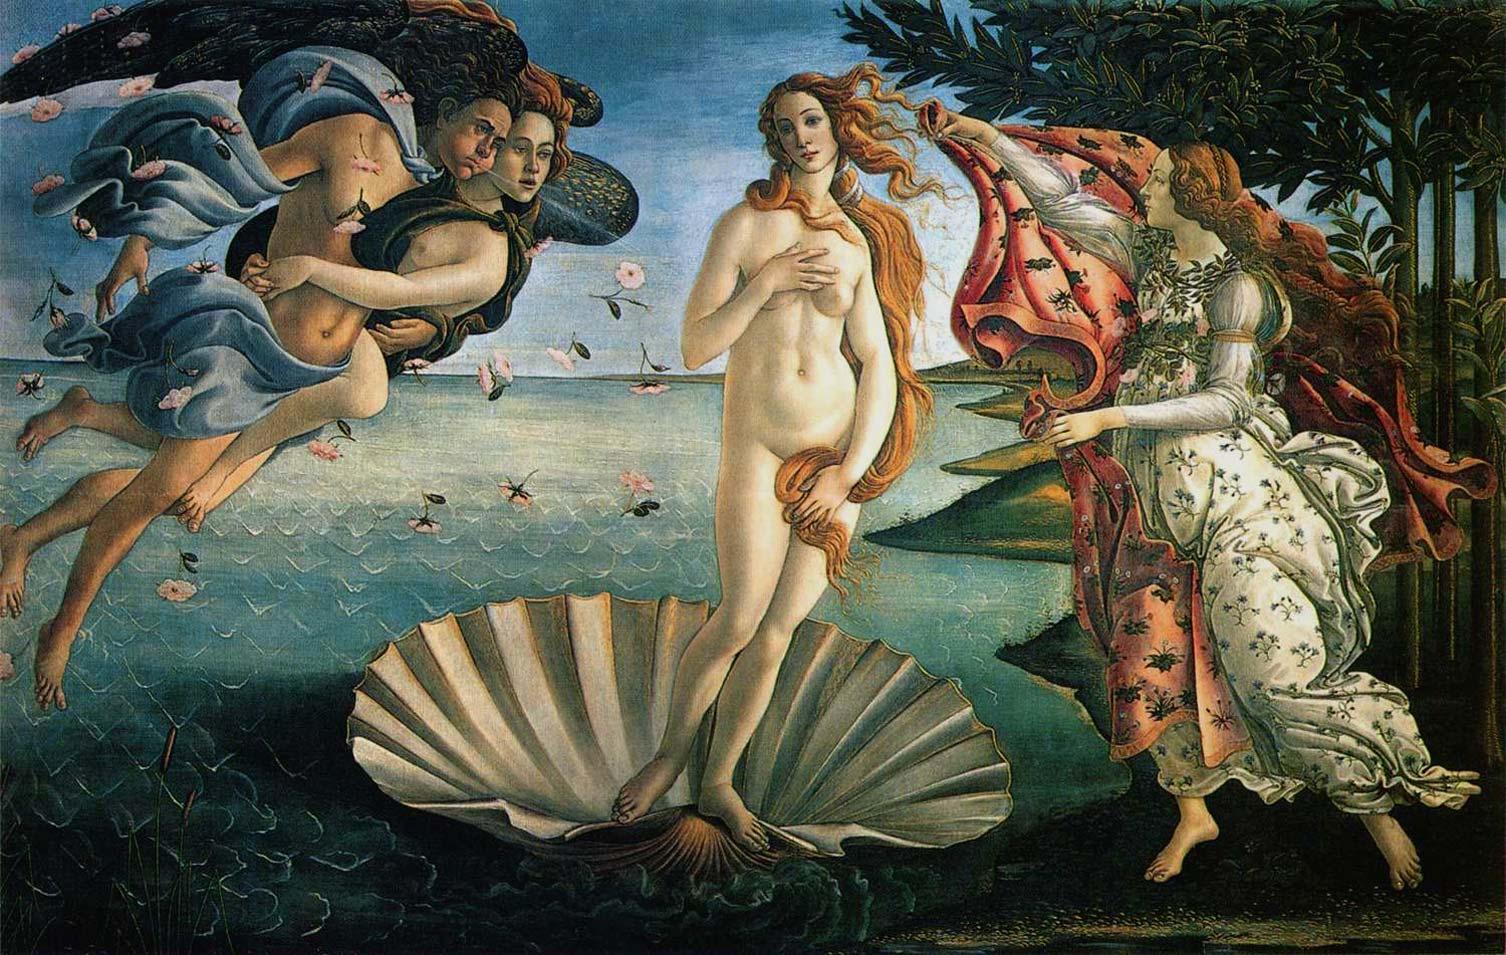 external image sandrobotticelli-the-birth-of-venus-1490.jpg